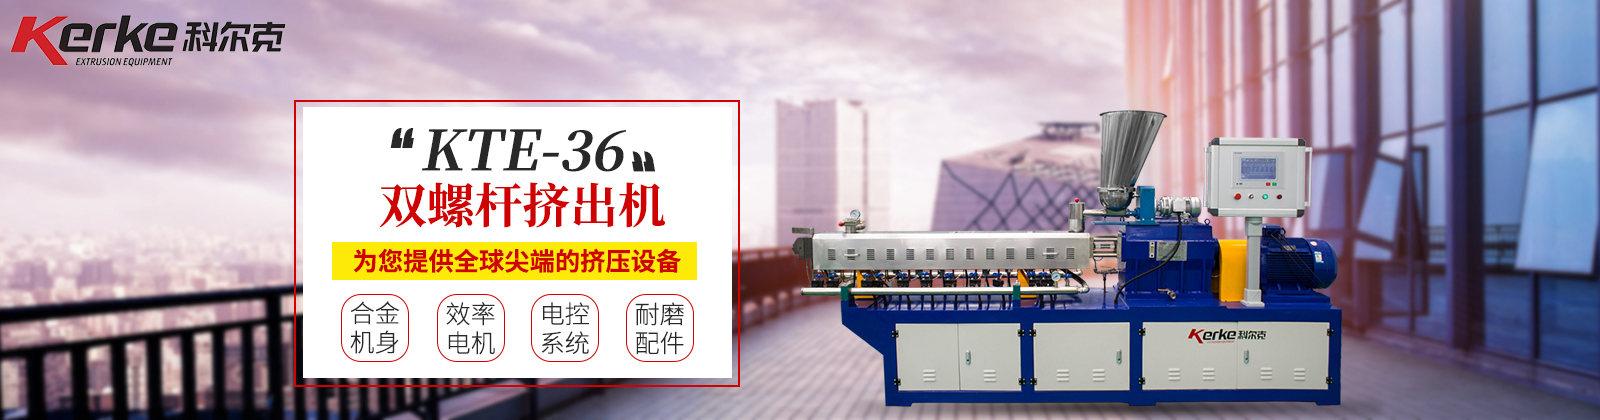 KTE36色母粒双螺杆挤出机,小型打样双螺杆造粒机,专业双螺杆制造商-南京科尔克